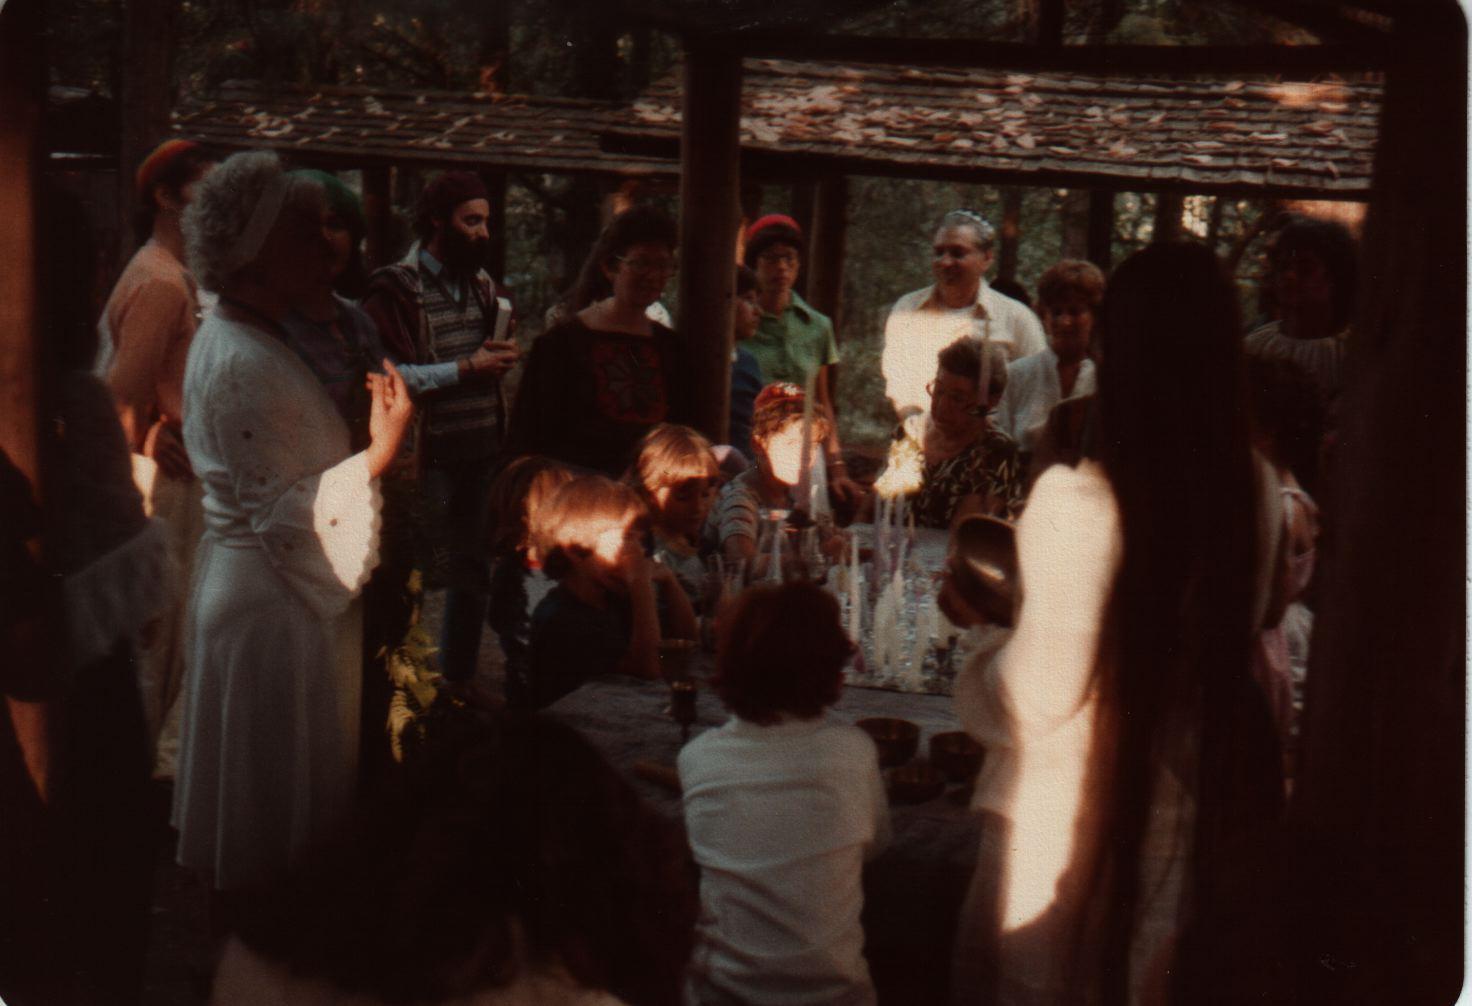 84 Joys  Circle for candlelighting, incl Miriam Jaobs, Avram Sand, Peter Tardos, Sara Shendelman, Yeshayah and Elishama Goldfarb copy.jpg